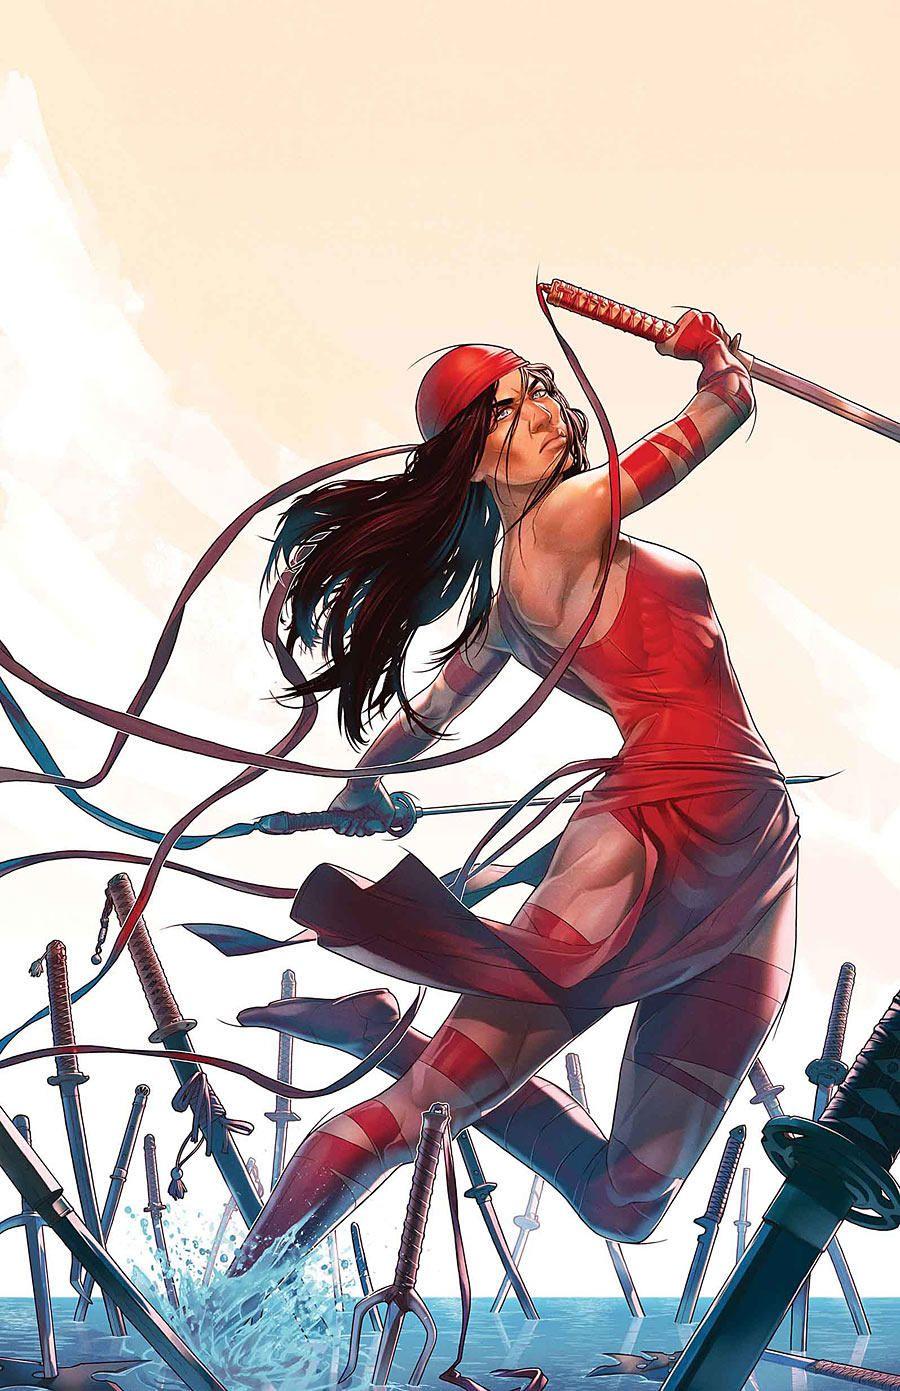 Pin De Master Obi Wan Kenobi Em Elektra Daredevil Master Ninjas